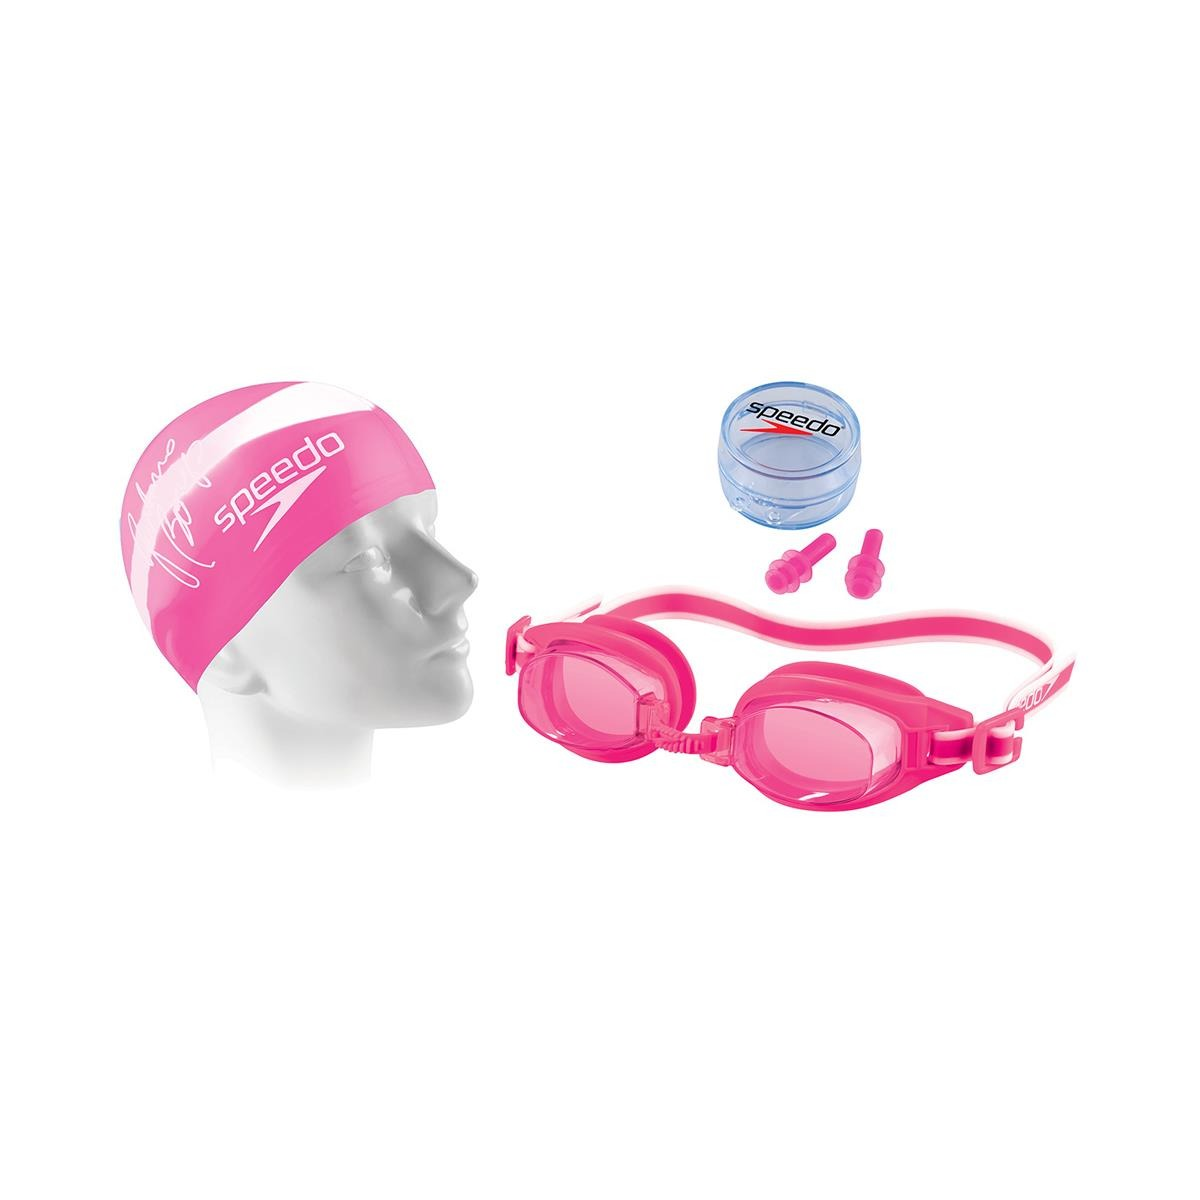 974bc8f893 kit de natação speedo swim adulto (3.0) - rosa. Carregando zoom.